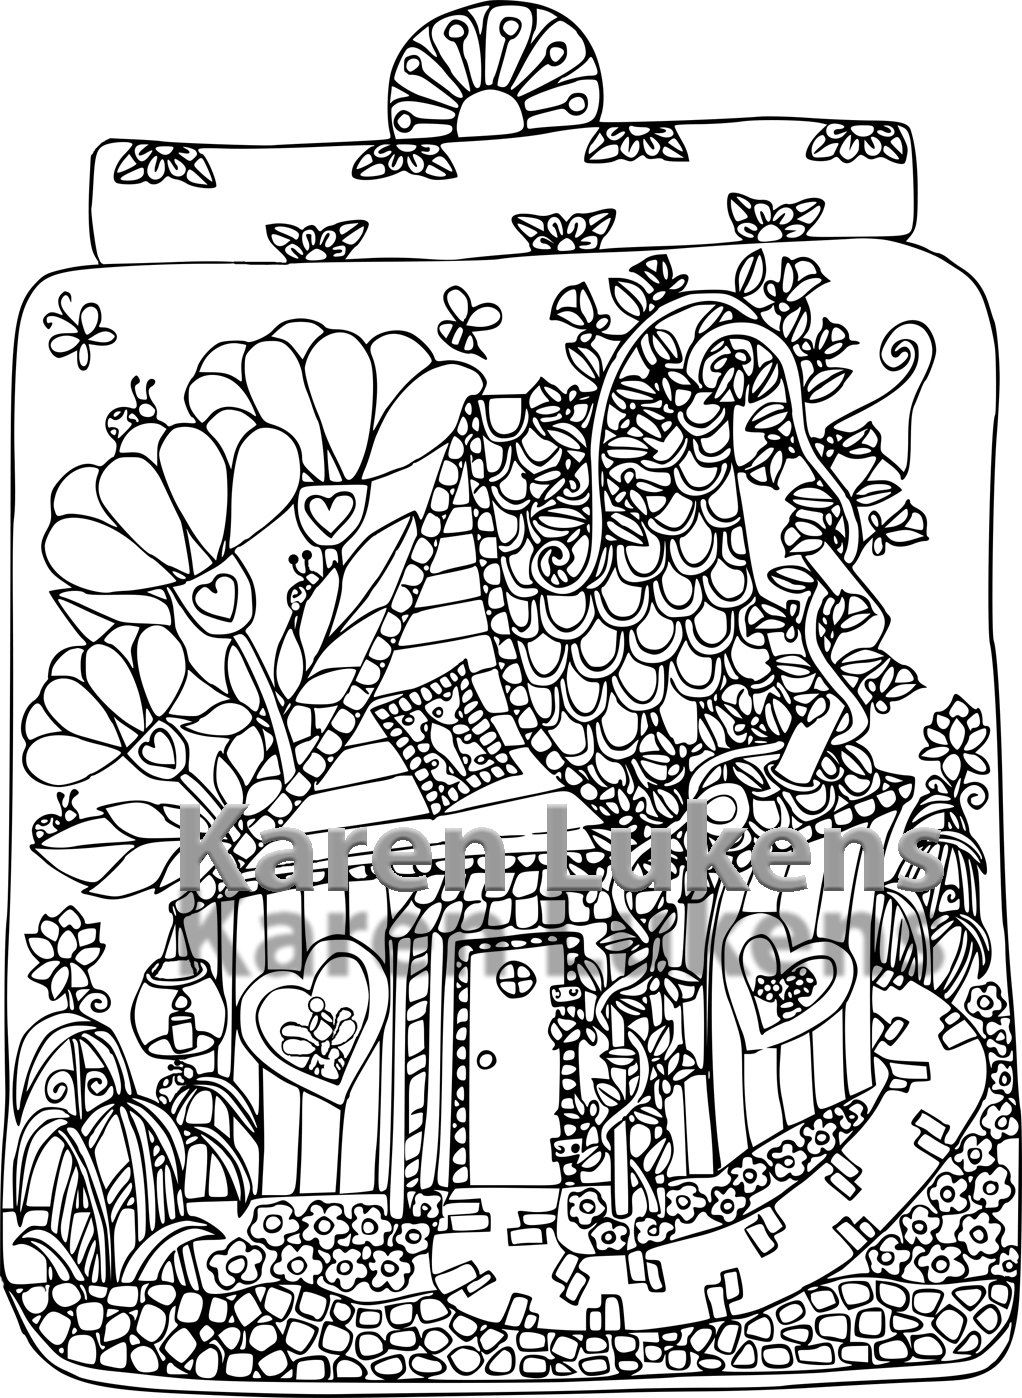 Bildergebnis für printable fairy house coloring pages